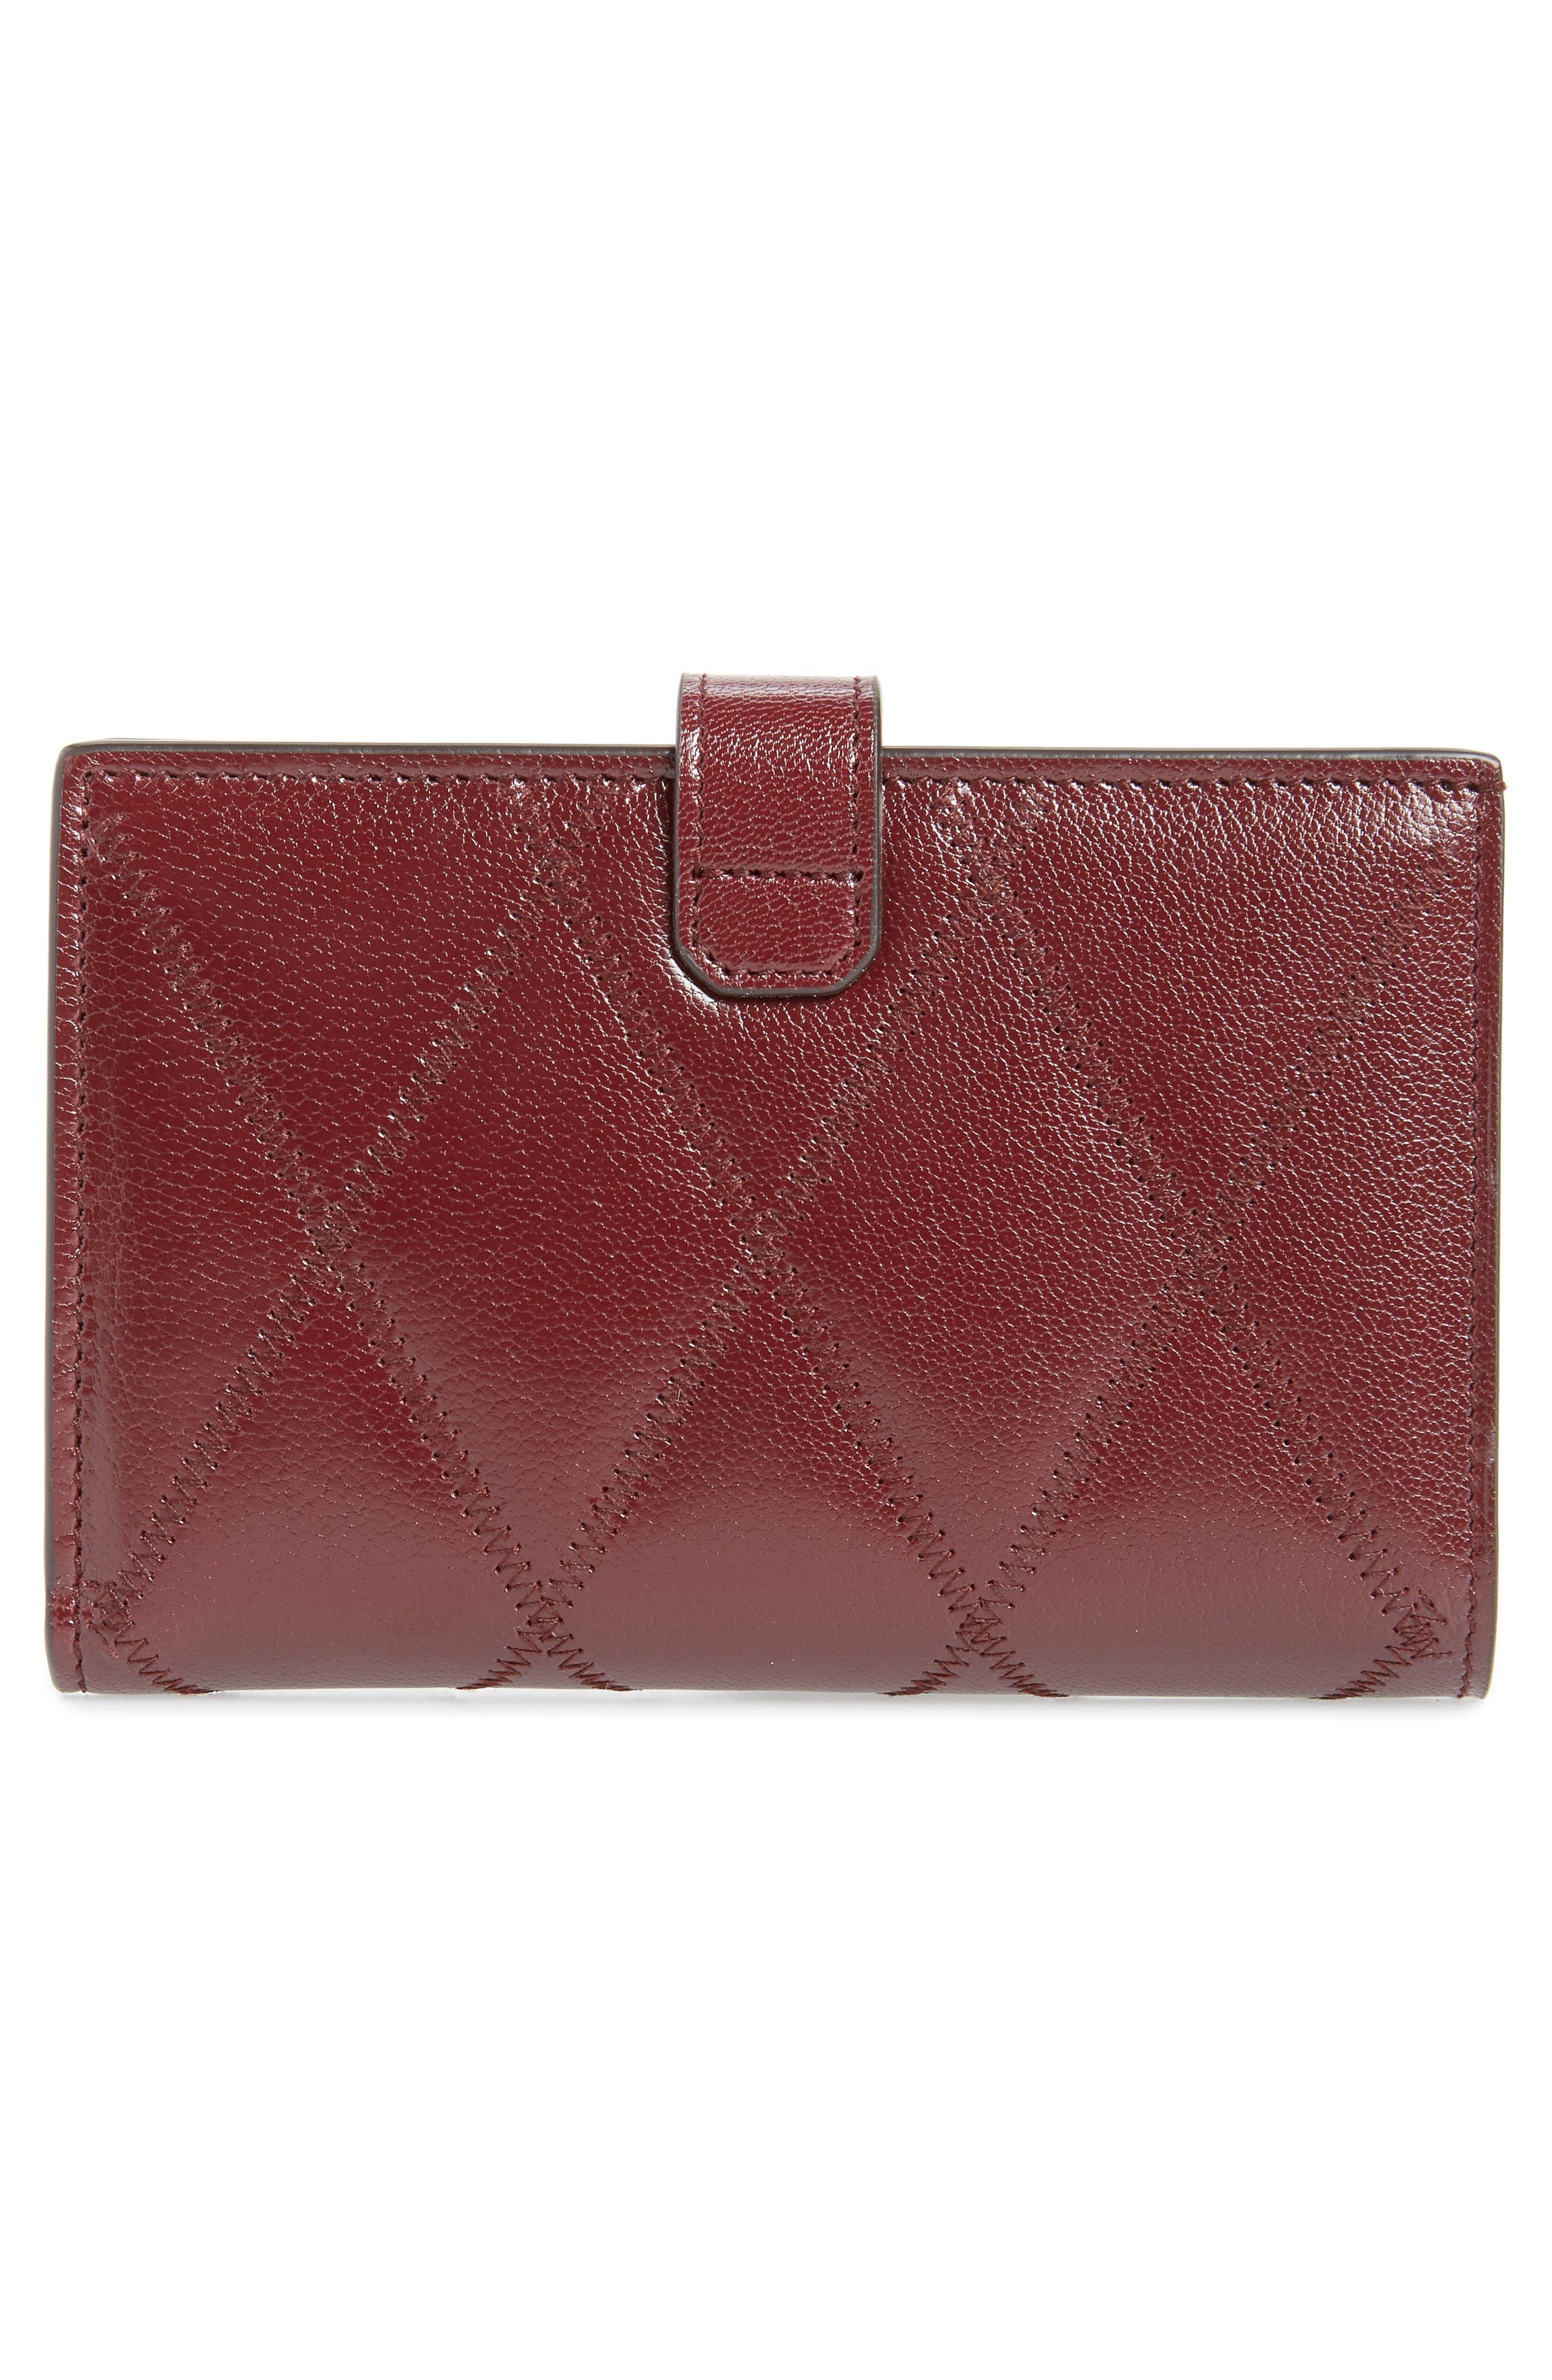 Medium GV3 Diamond Quilted Leather Wallet,                             Alternate thumbnail 4, color,                             AUBERGINE